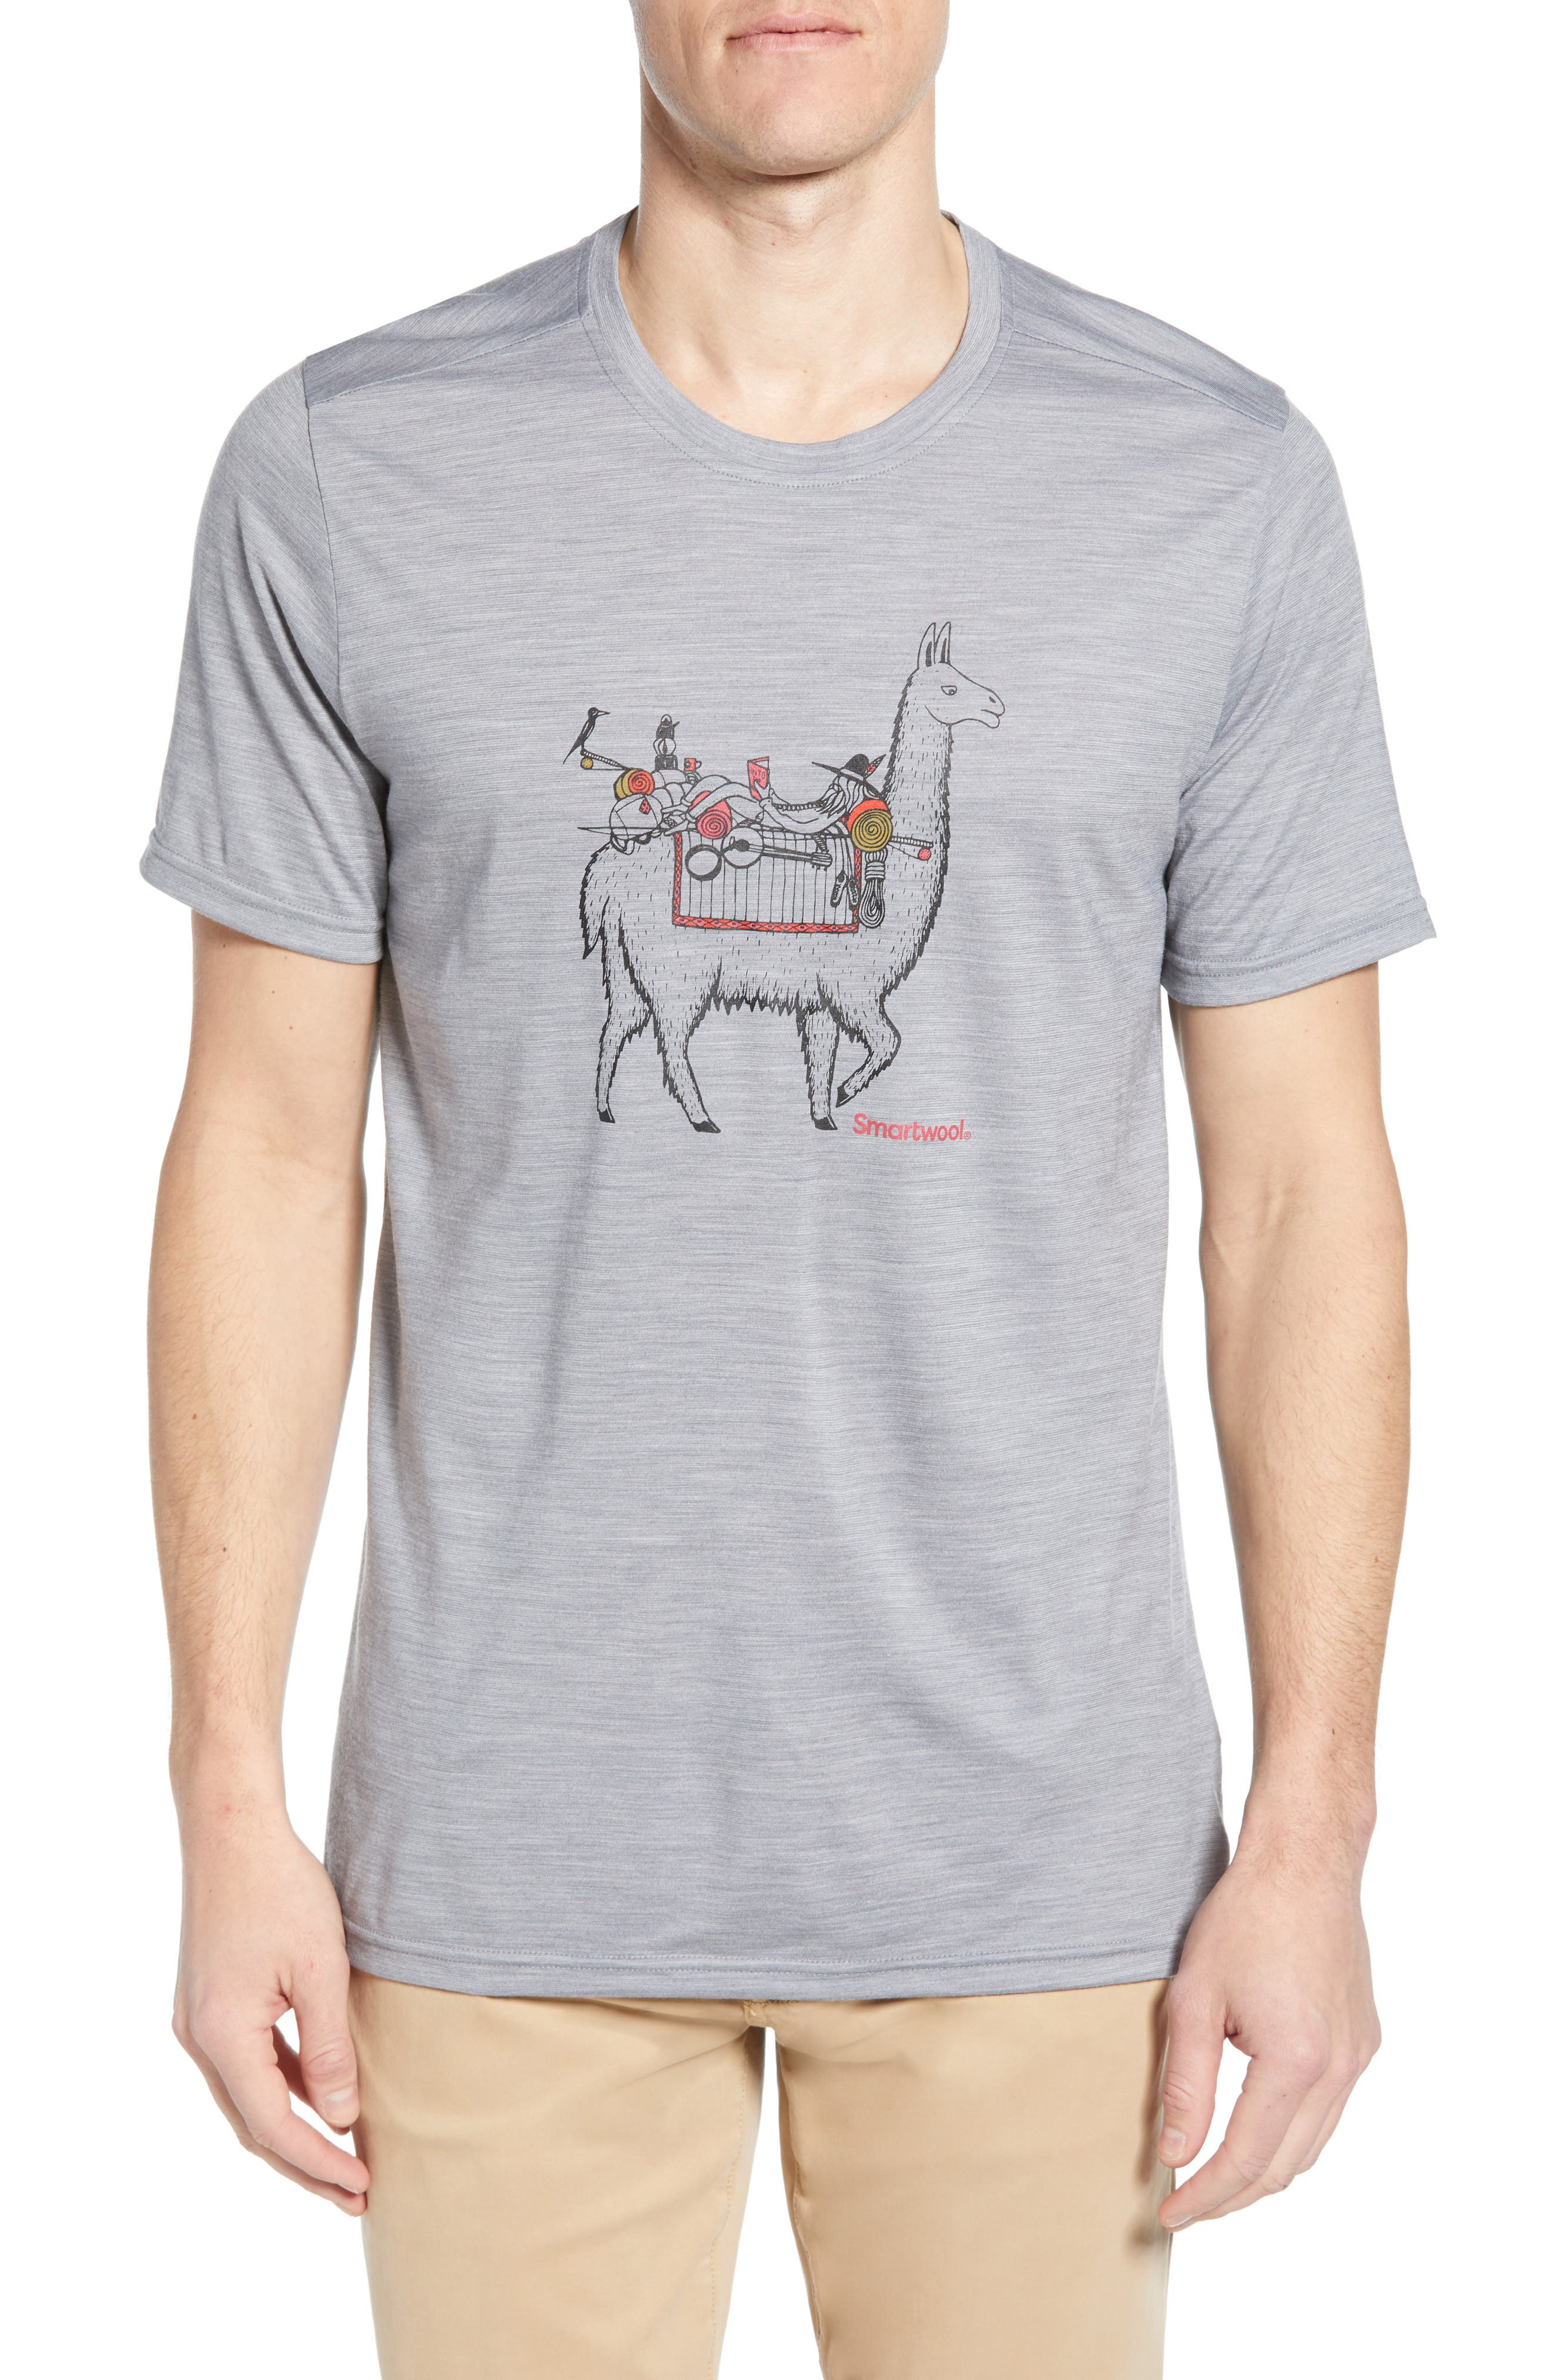 Smartwool Merino Llama Adventures T-Shirt, Grey